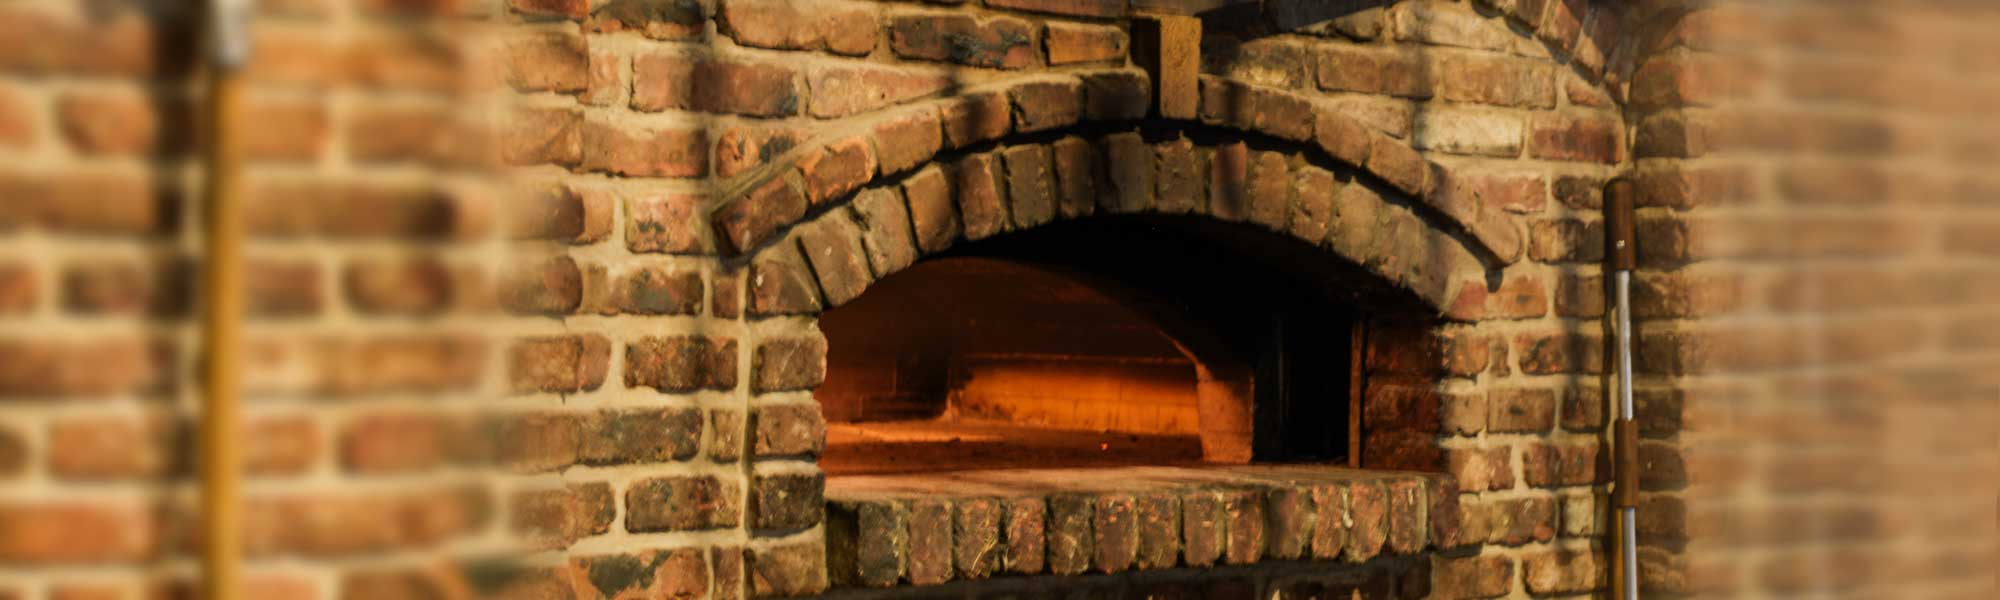 Brick Oven Pizza Hell S Kitchen